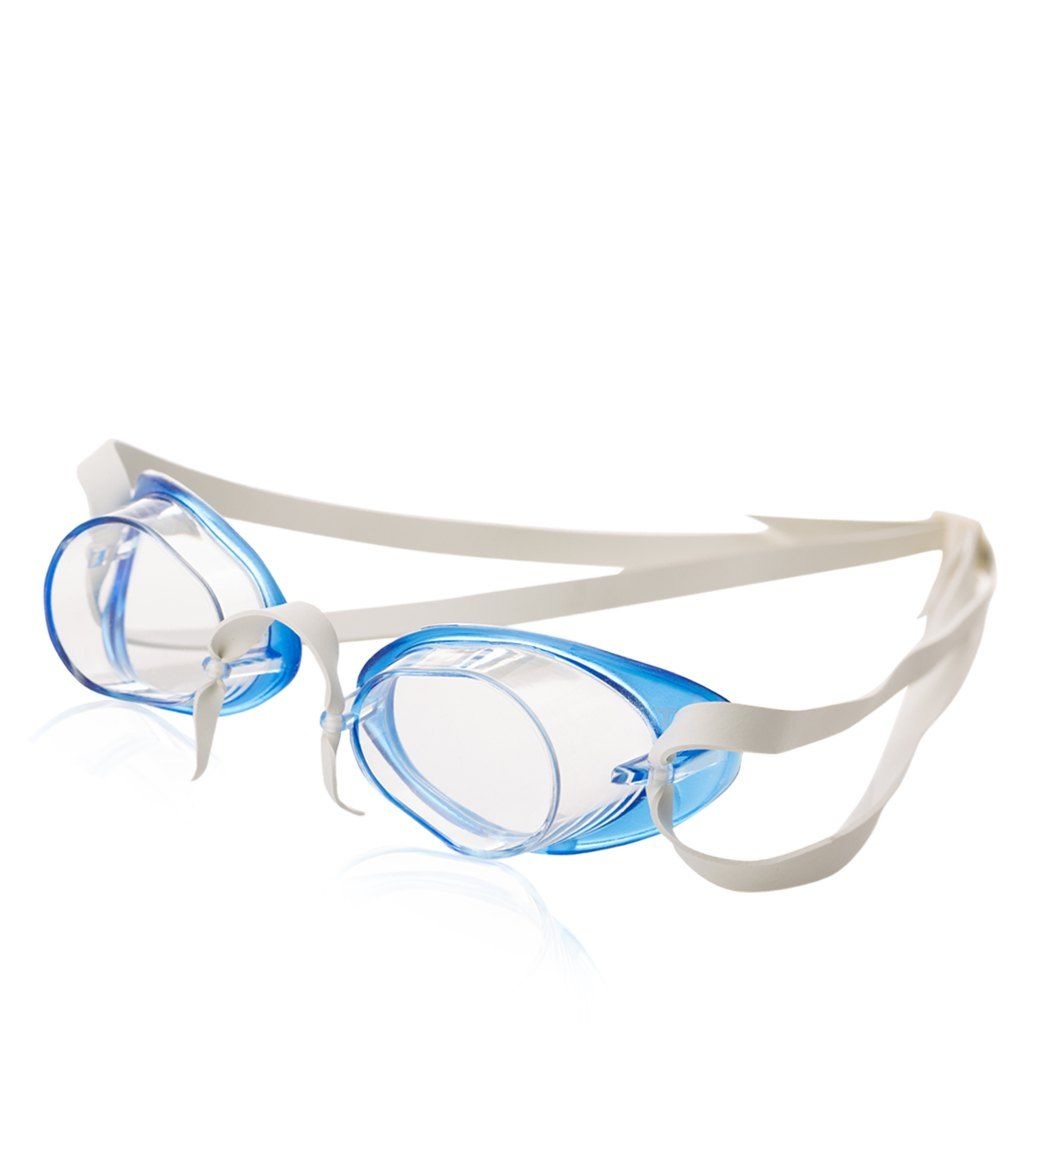 2c43844ef99 TYR Socket Rocket 2.0 Swim Goggles at SwimOutlet.com - The Web s most  popular swim